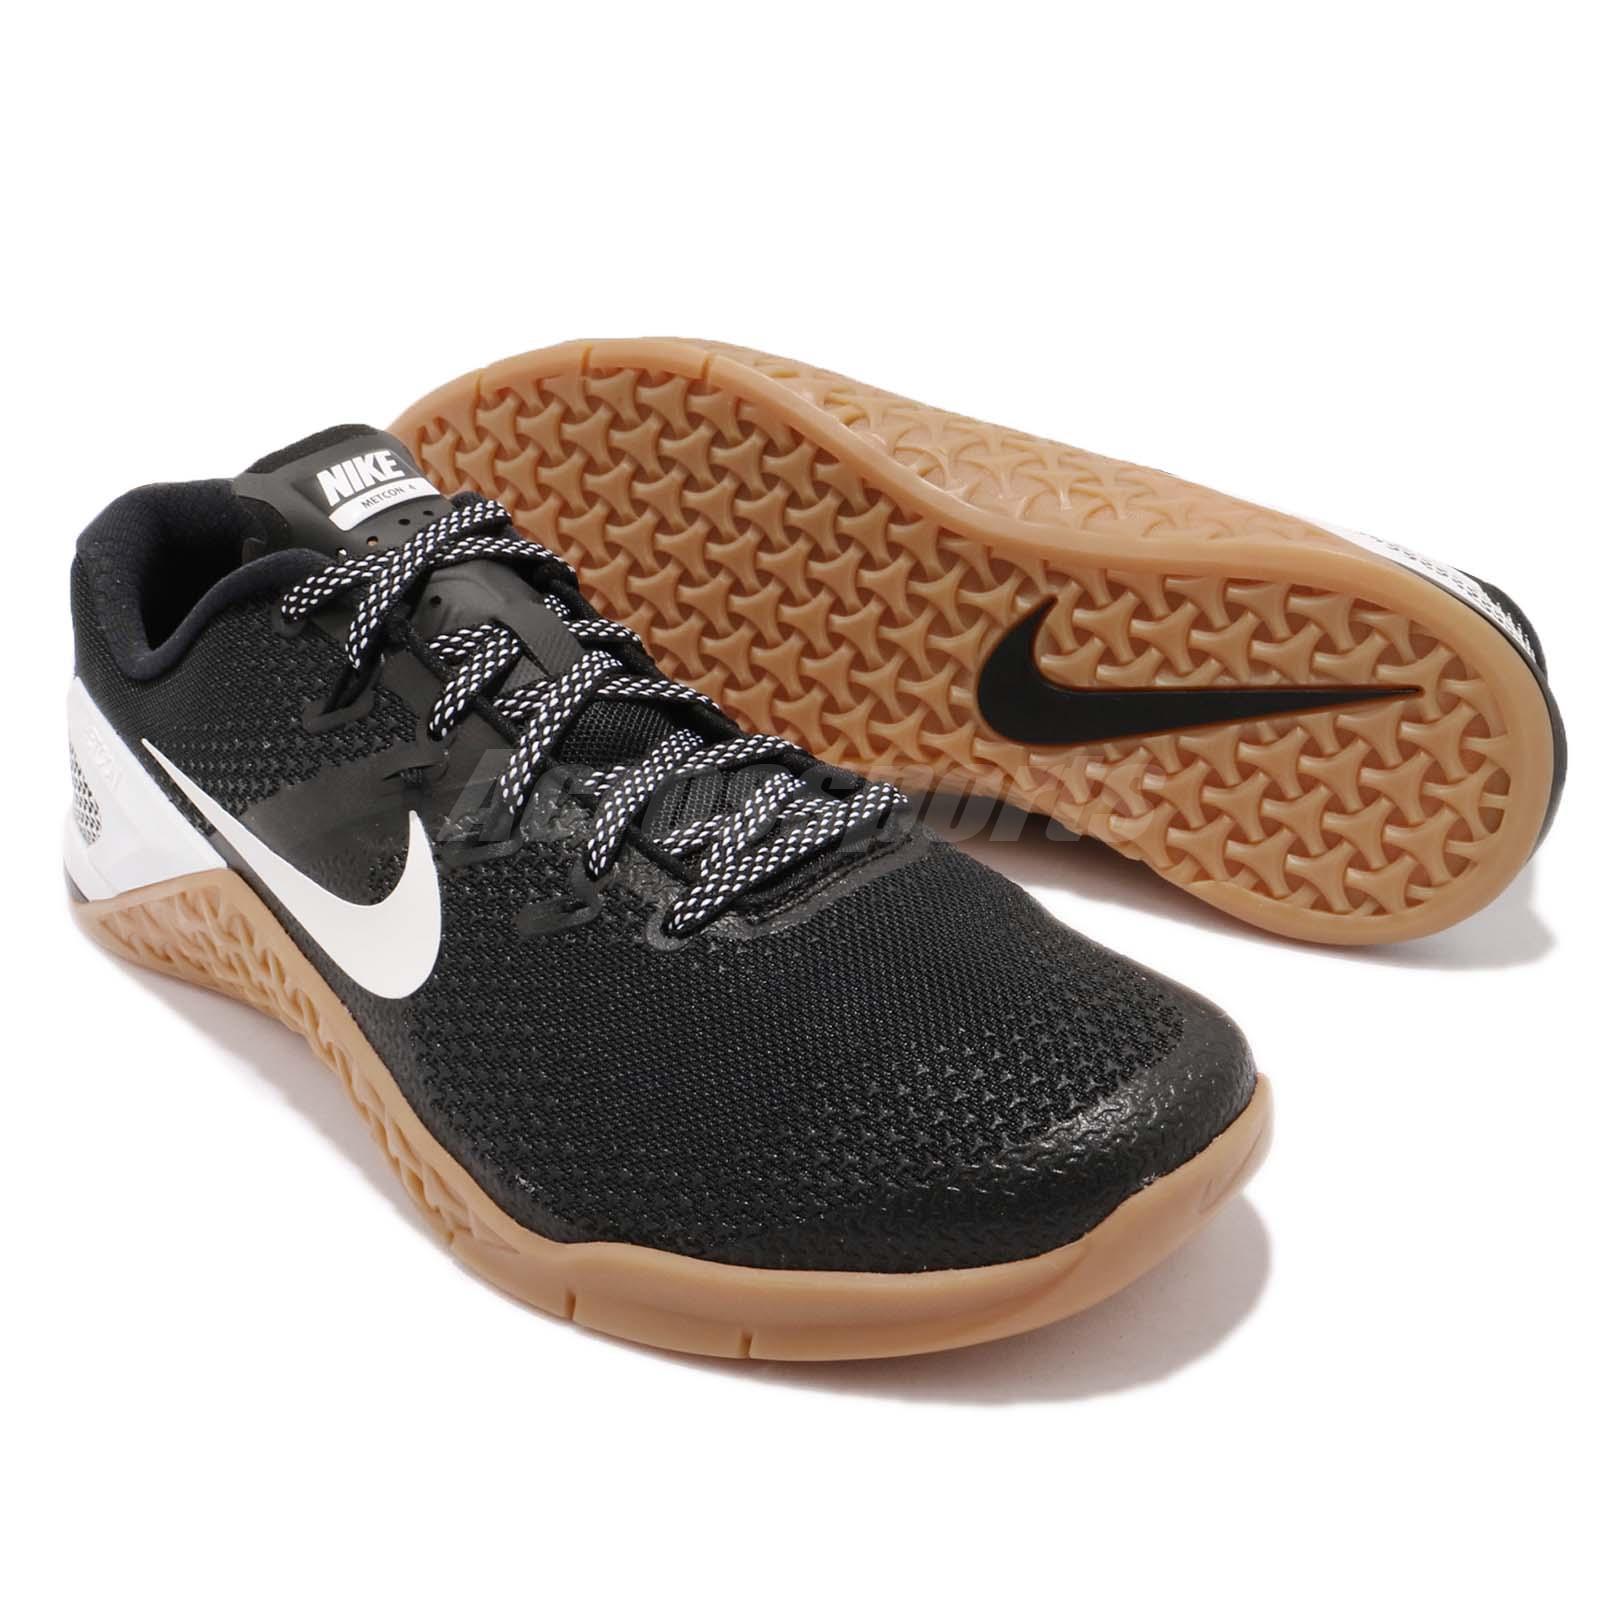 newest 2bacc f27d1 Nike Metcon 4 IV Black White Gum Men Cross Training Shoes Sneakers ...